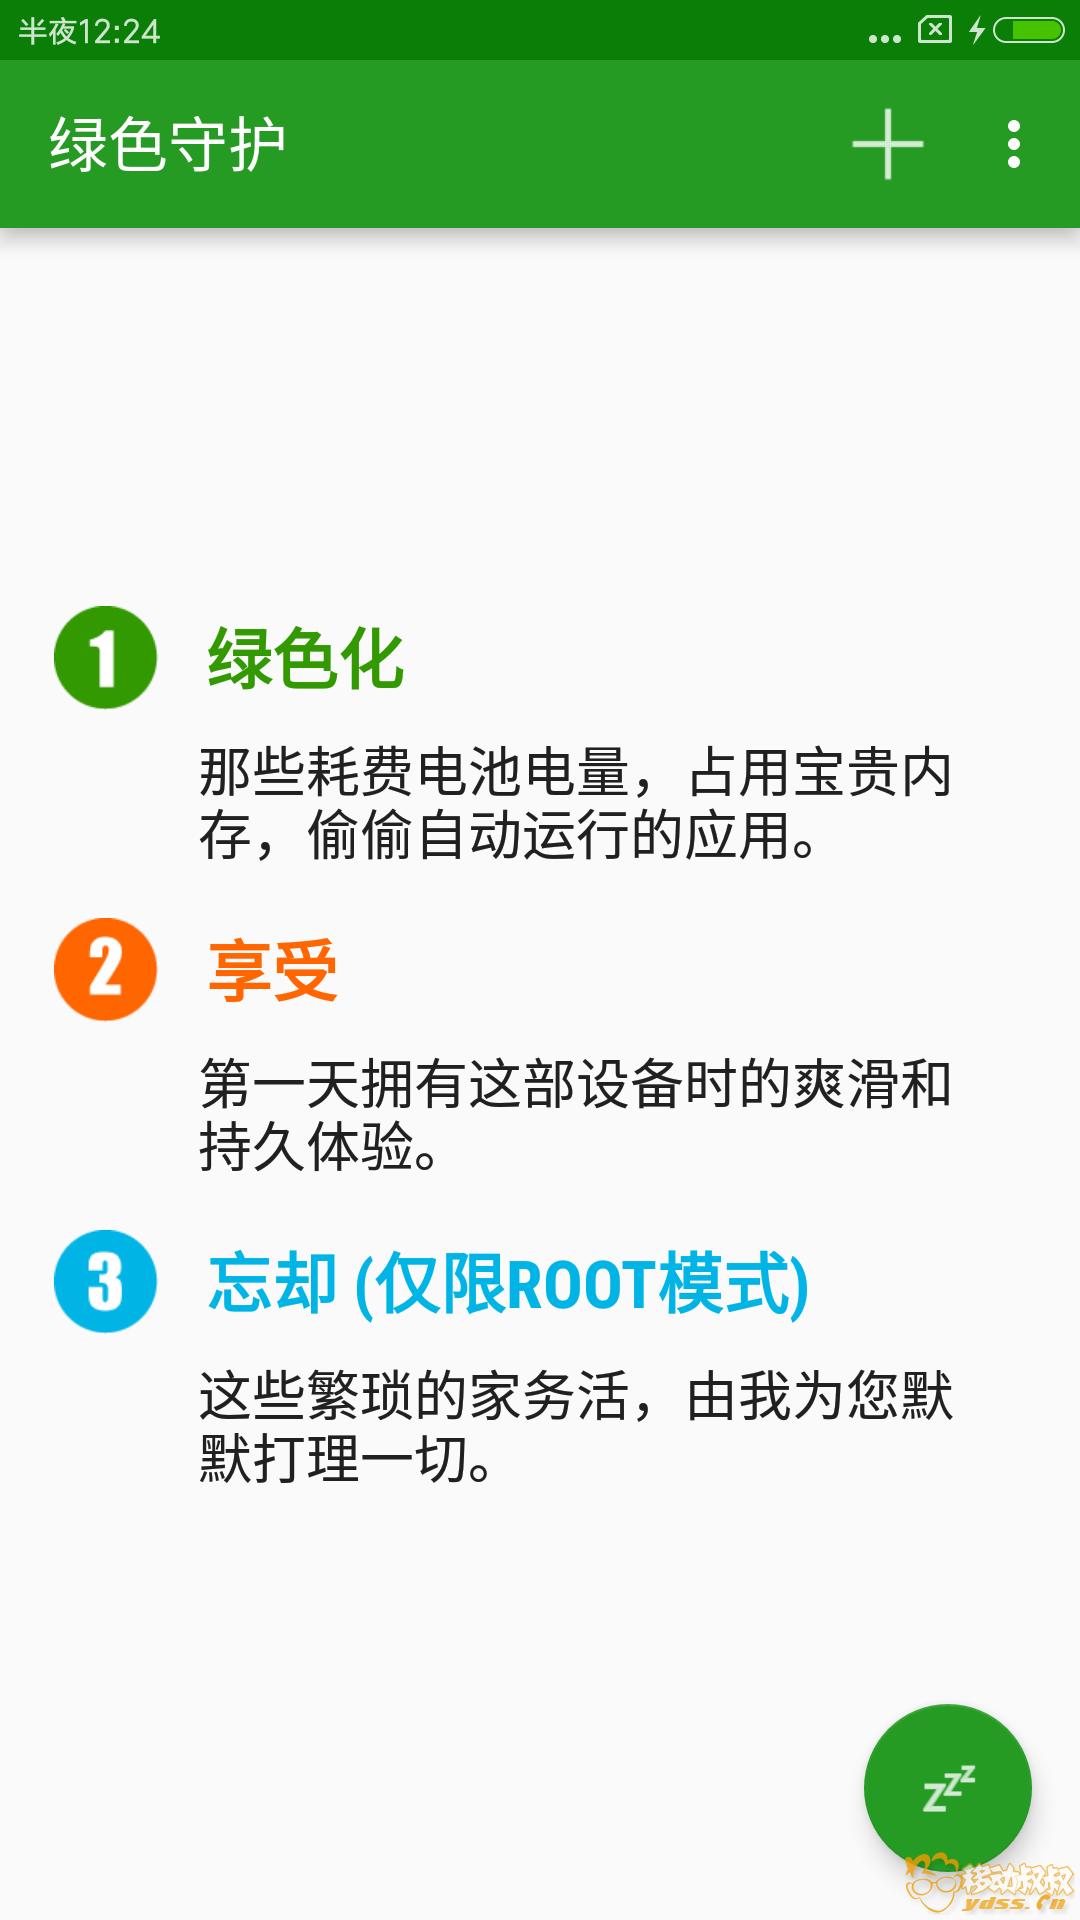 Screenshot_2017-07-04-00-24-27-093_com.oasisfeng.greenify.png